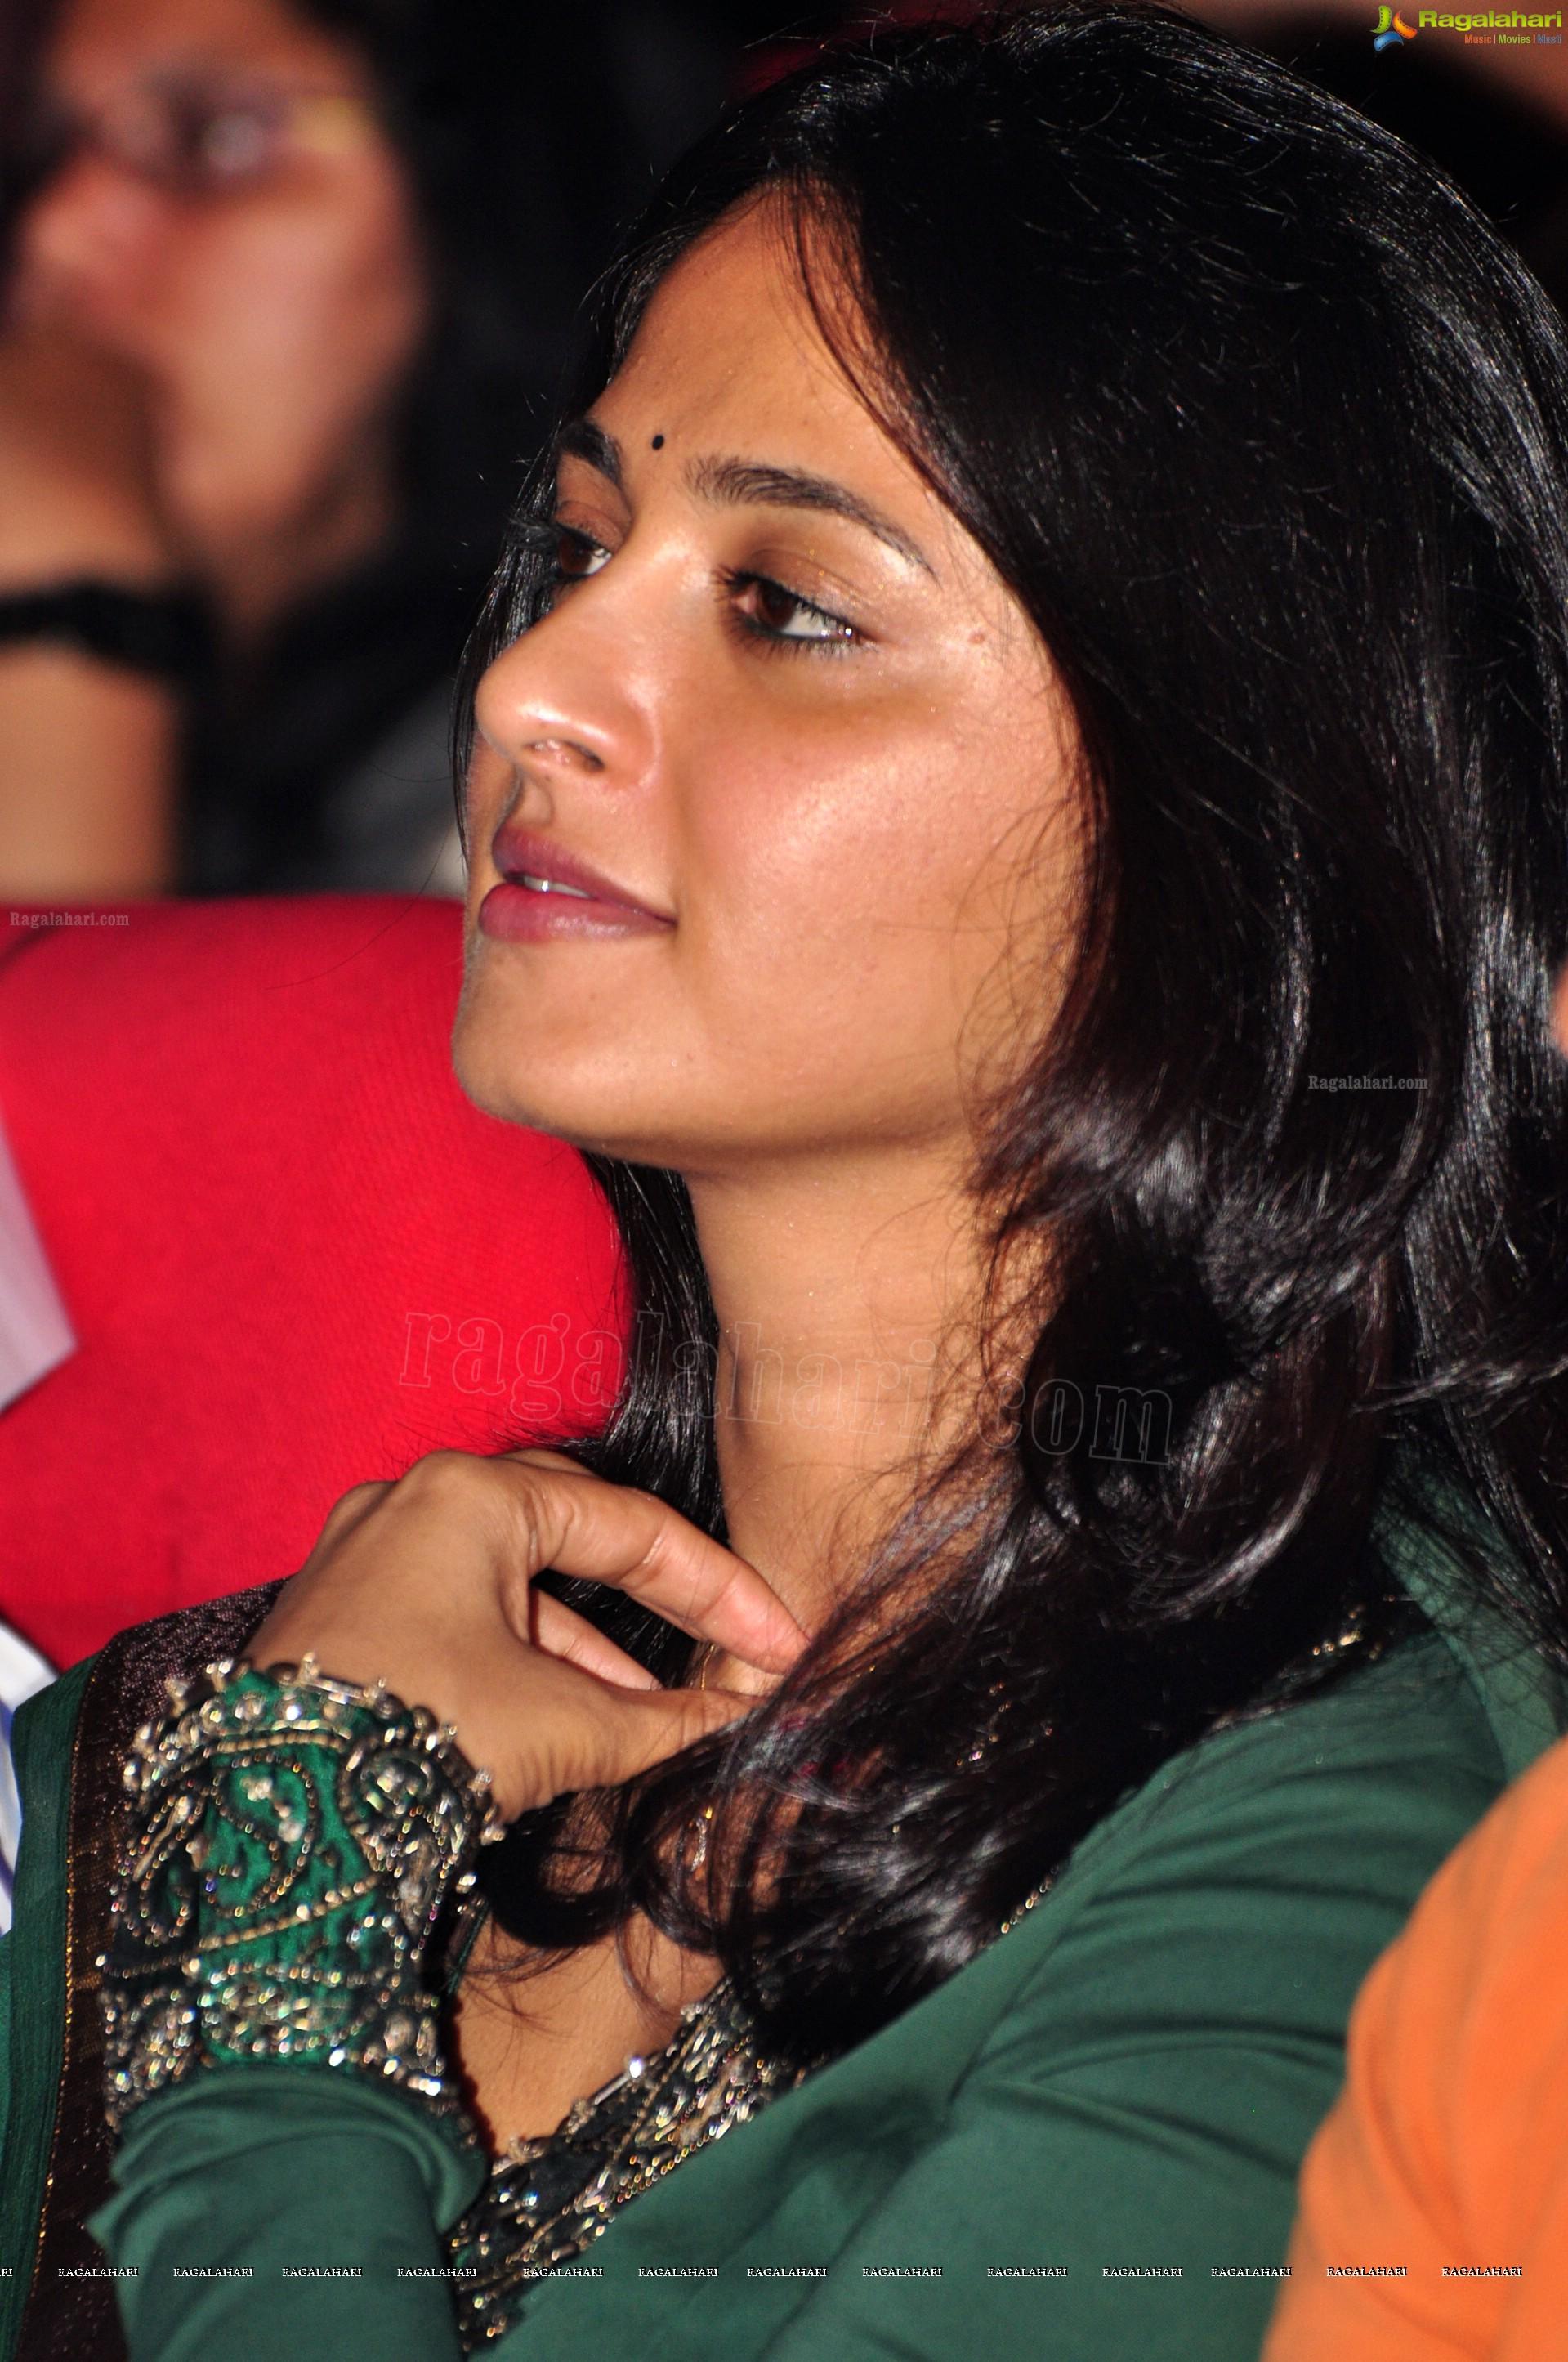 anushka shetty (hd) image 77 | beautiful tollywood actress images